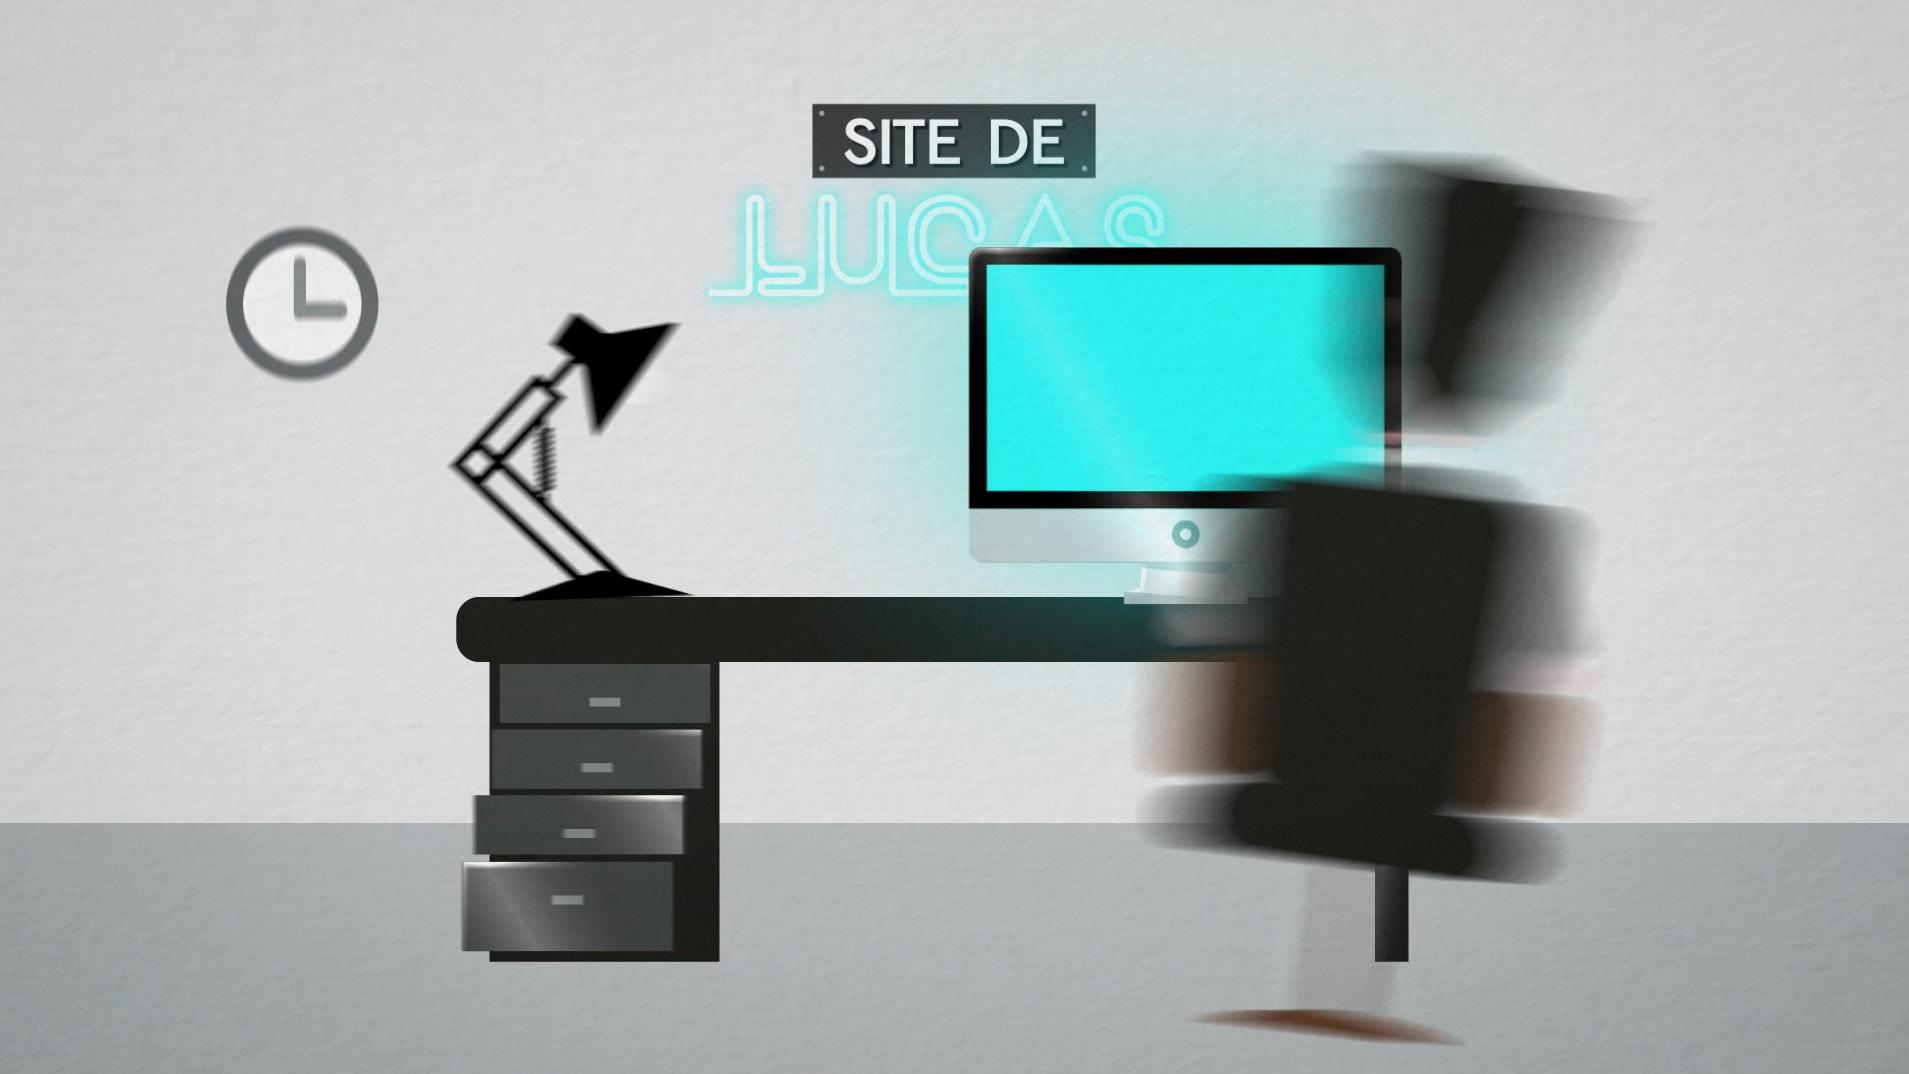 animation, motiondesign, videoanimation, videodessin, motionvideo, corporateanimation, cubriksanimation, animationtypographique, aftereffect,